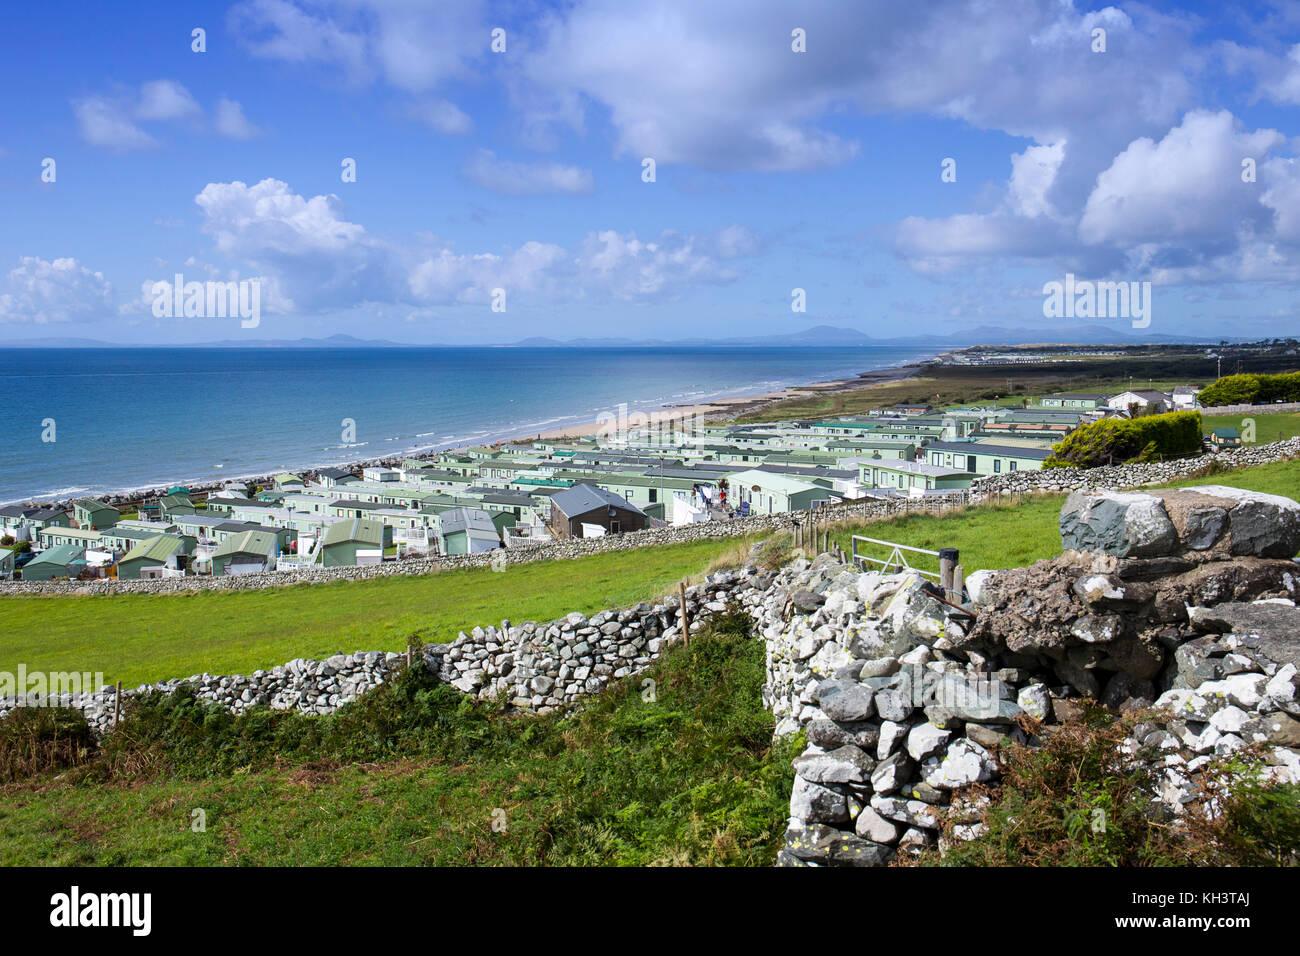 Caerddaniel Holiday Home Park, near Barmouth, overlooking Cardigan Bay in Snowdonia National Park, Wales UK - Stock Image